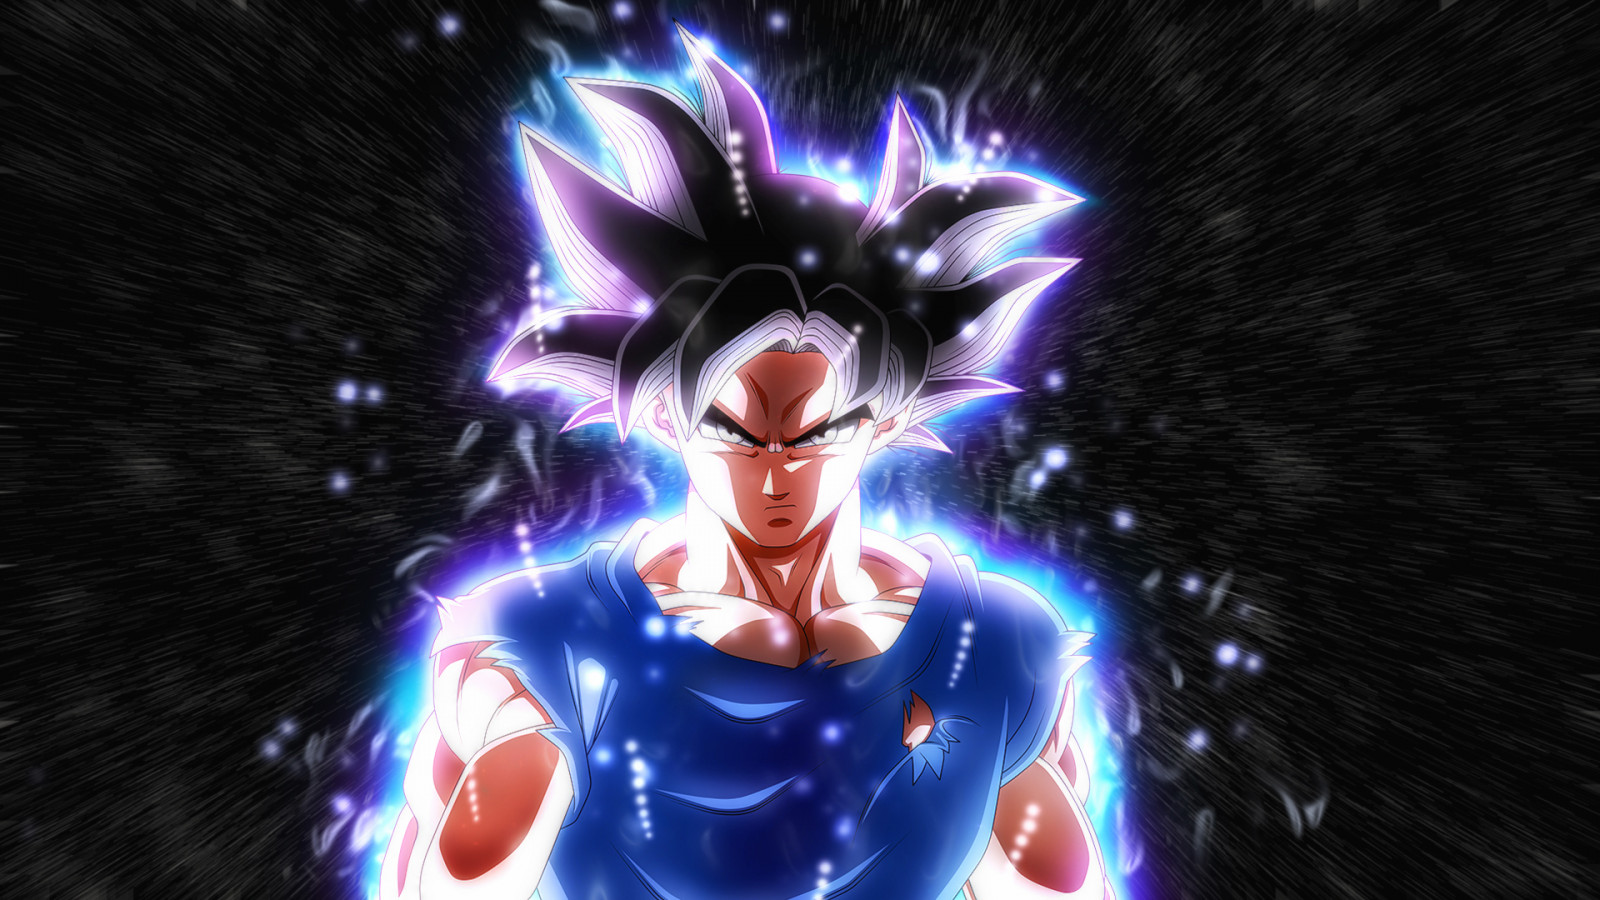 Super Saiyan Live Wallpaper Iphone X Wallpaper Son Goku Dragon Ball Super Ultra Instinct